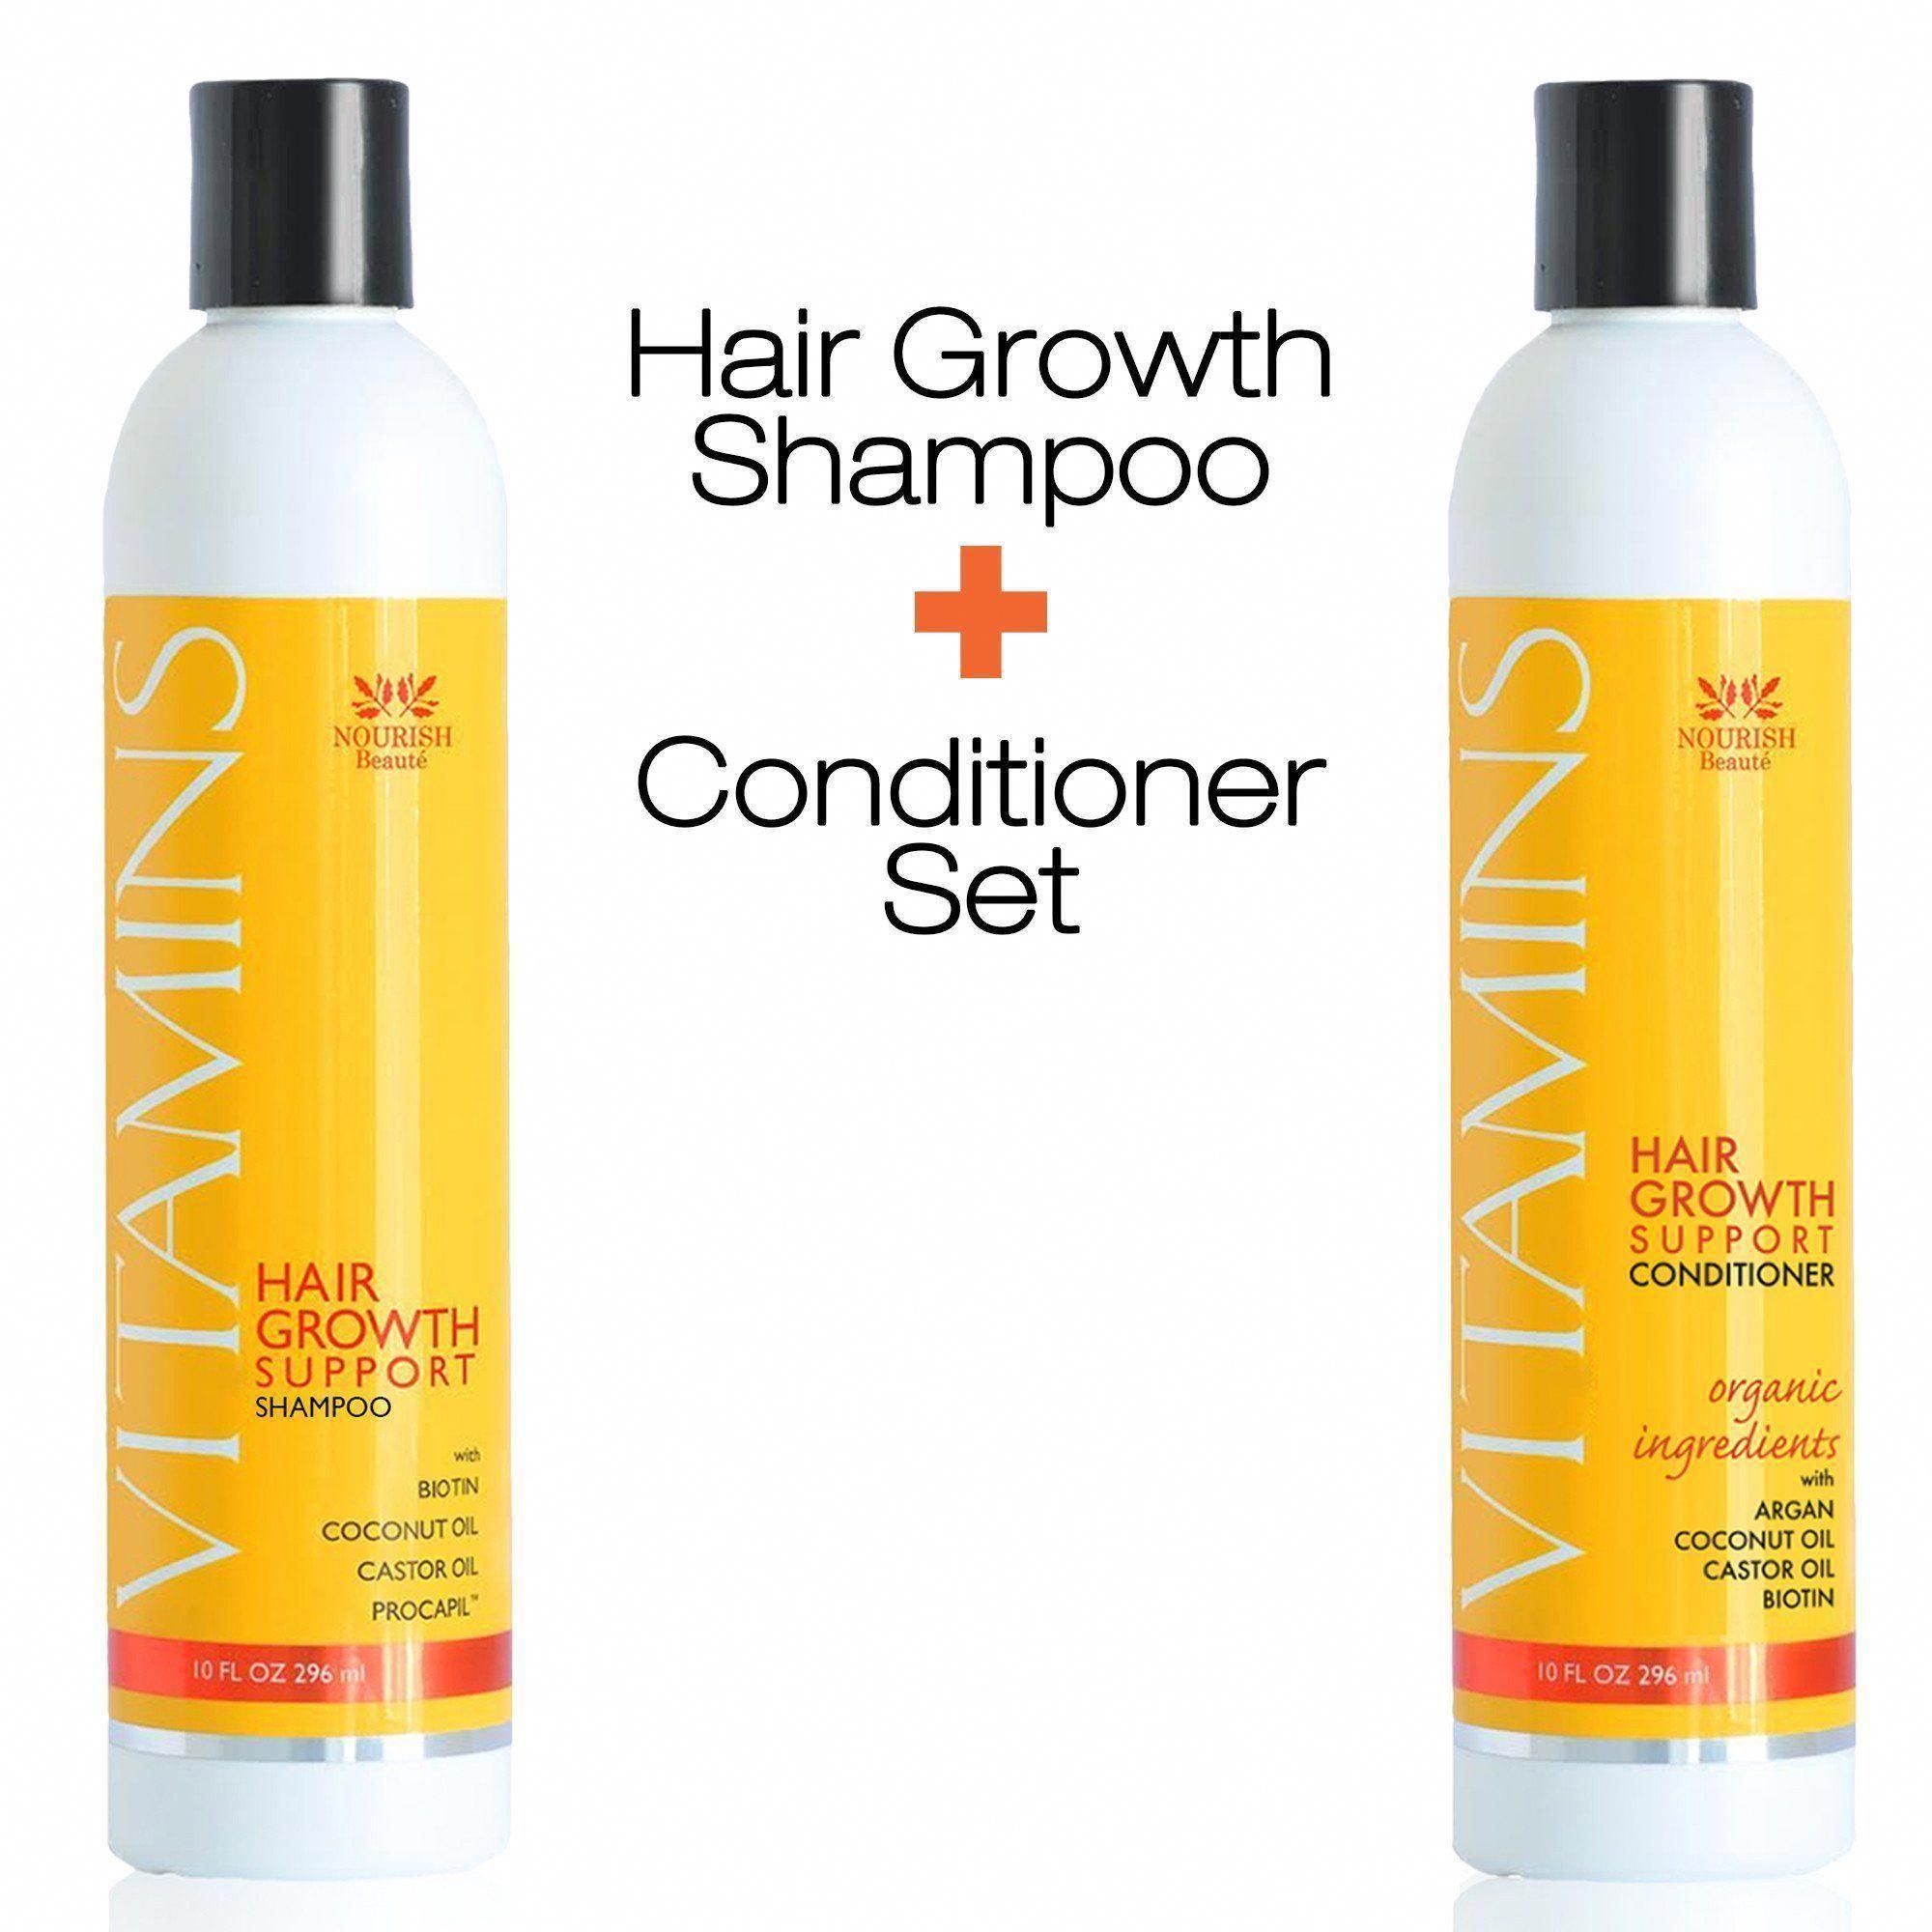 Vitamins Hair Growth Support Shampoo Conditioner Vitaminy Dlya Rosta Volos Vitaminy Dlya Volos Vypadenie Volos U Zhenshin